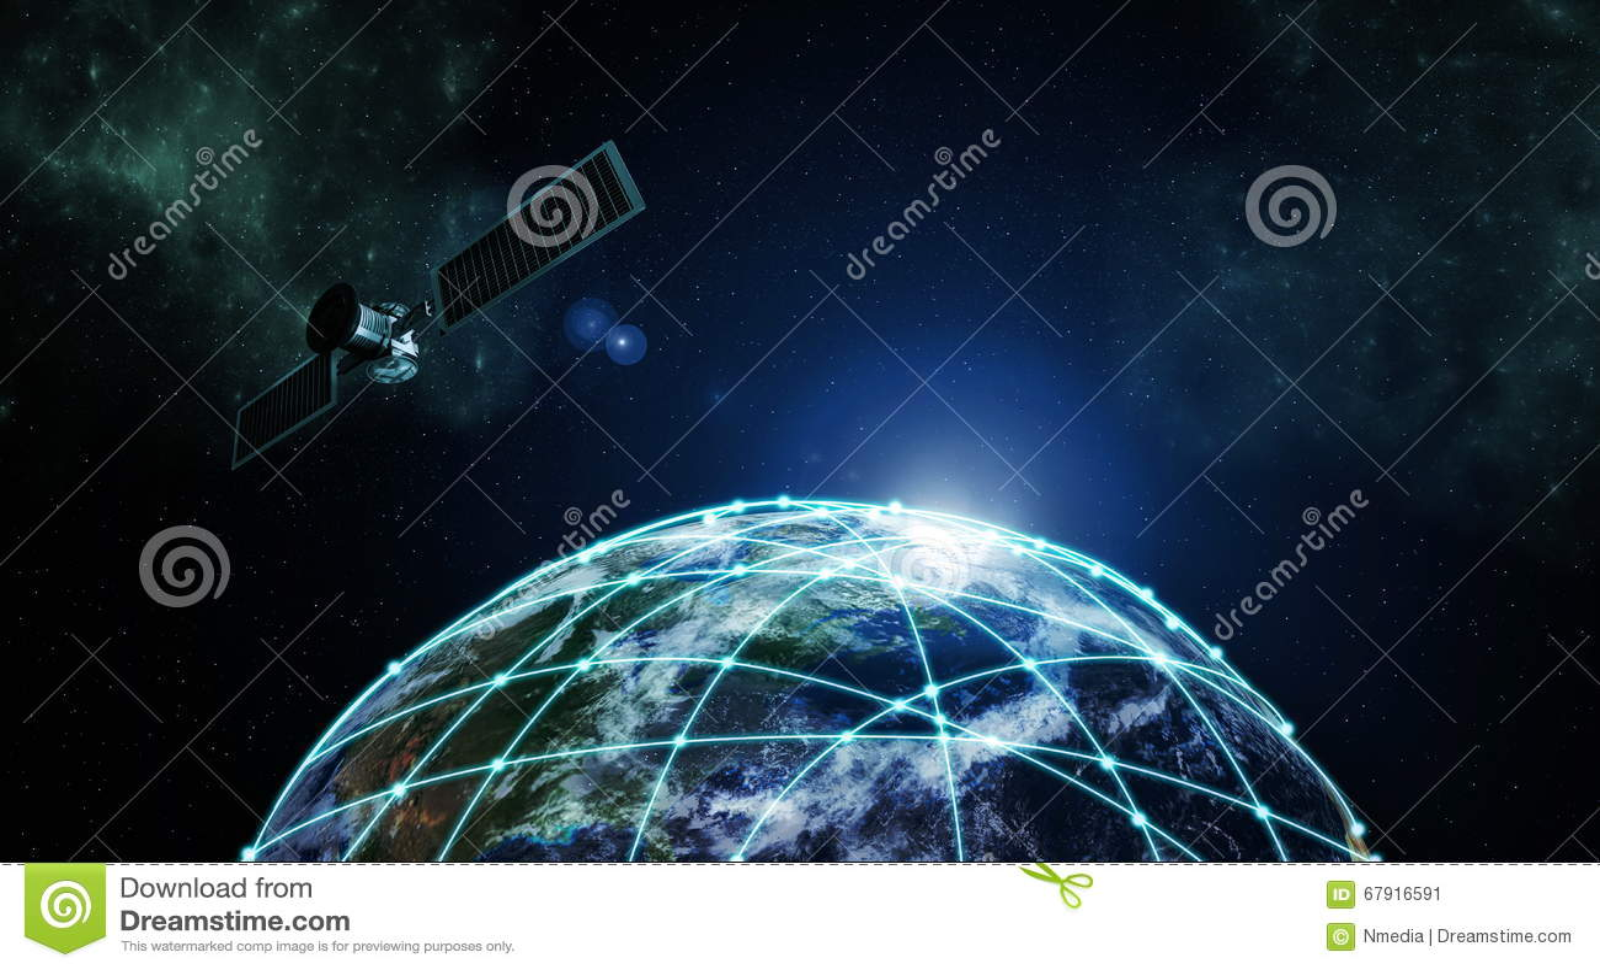 Internet information technology stock illustration for Internet plante